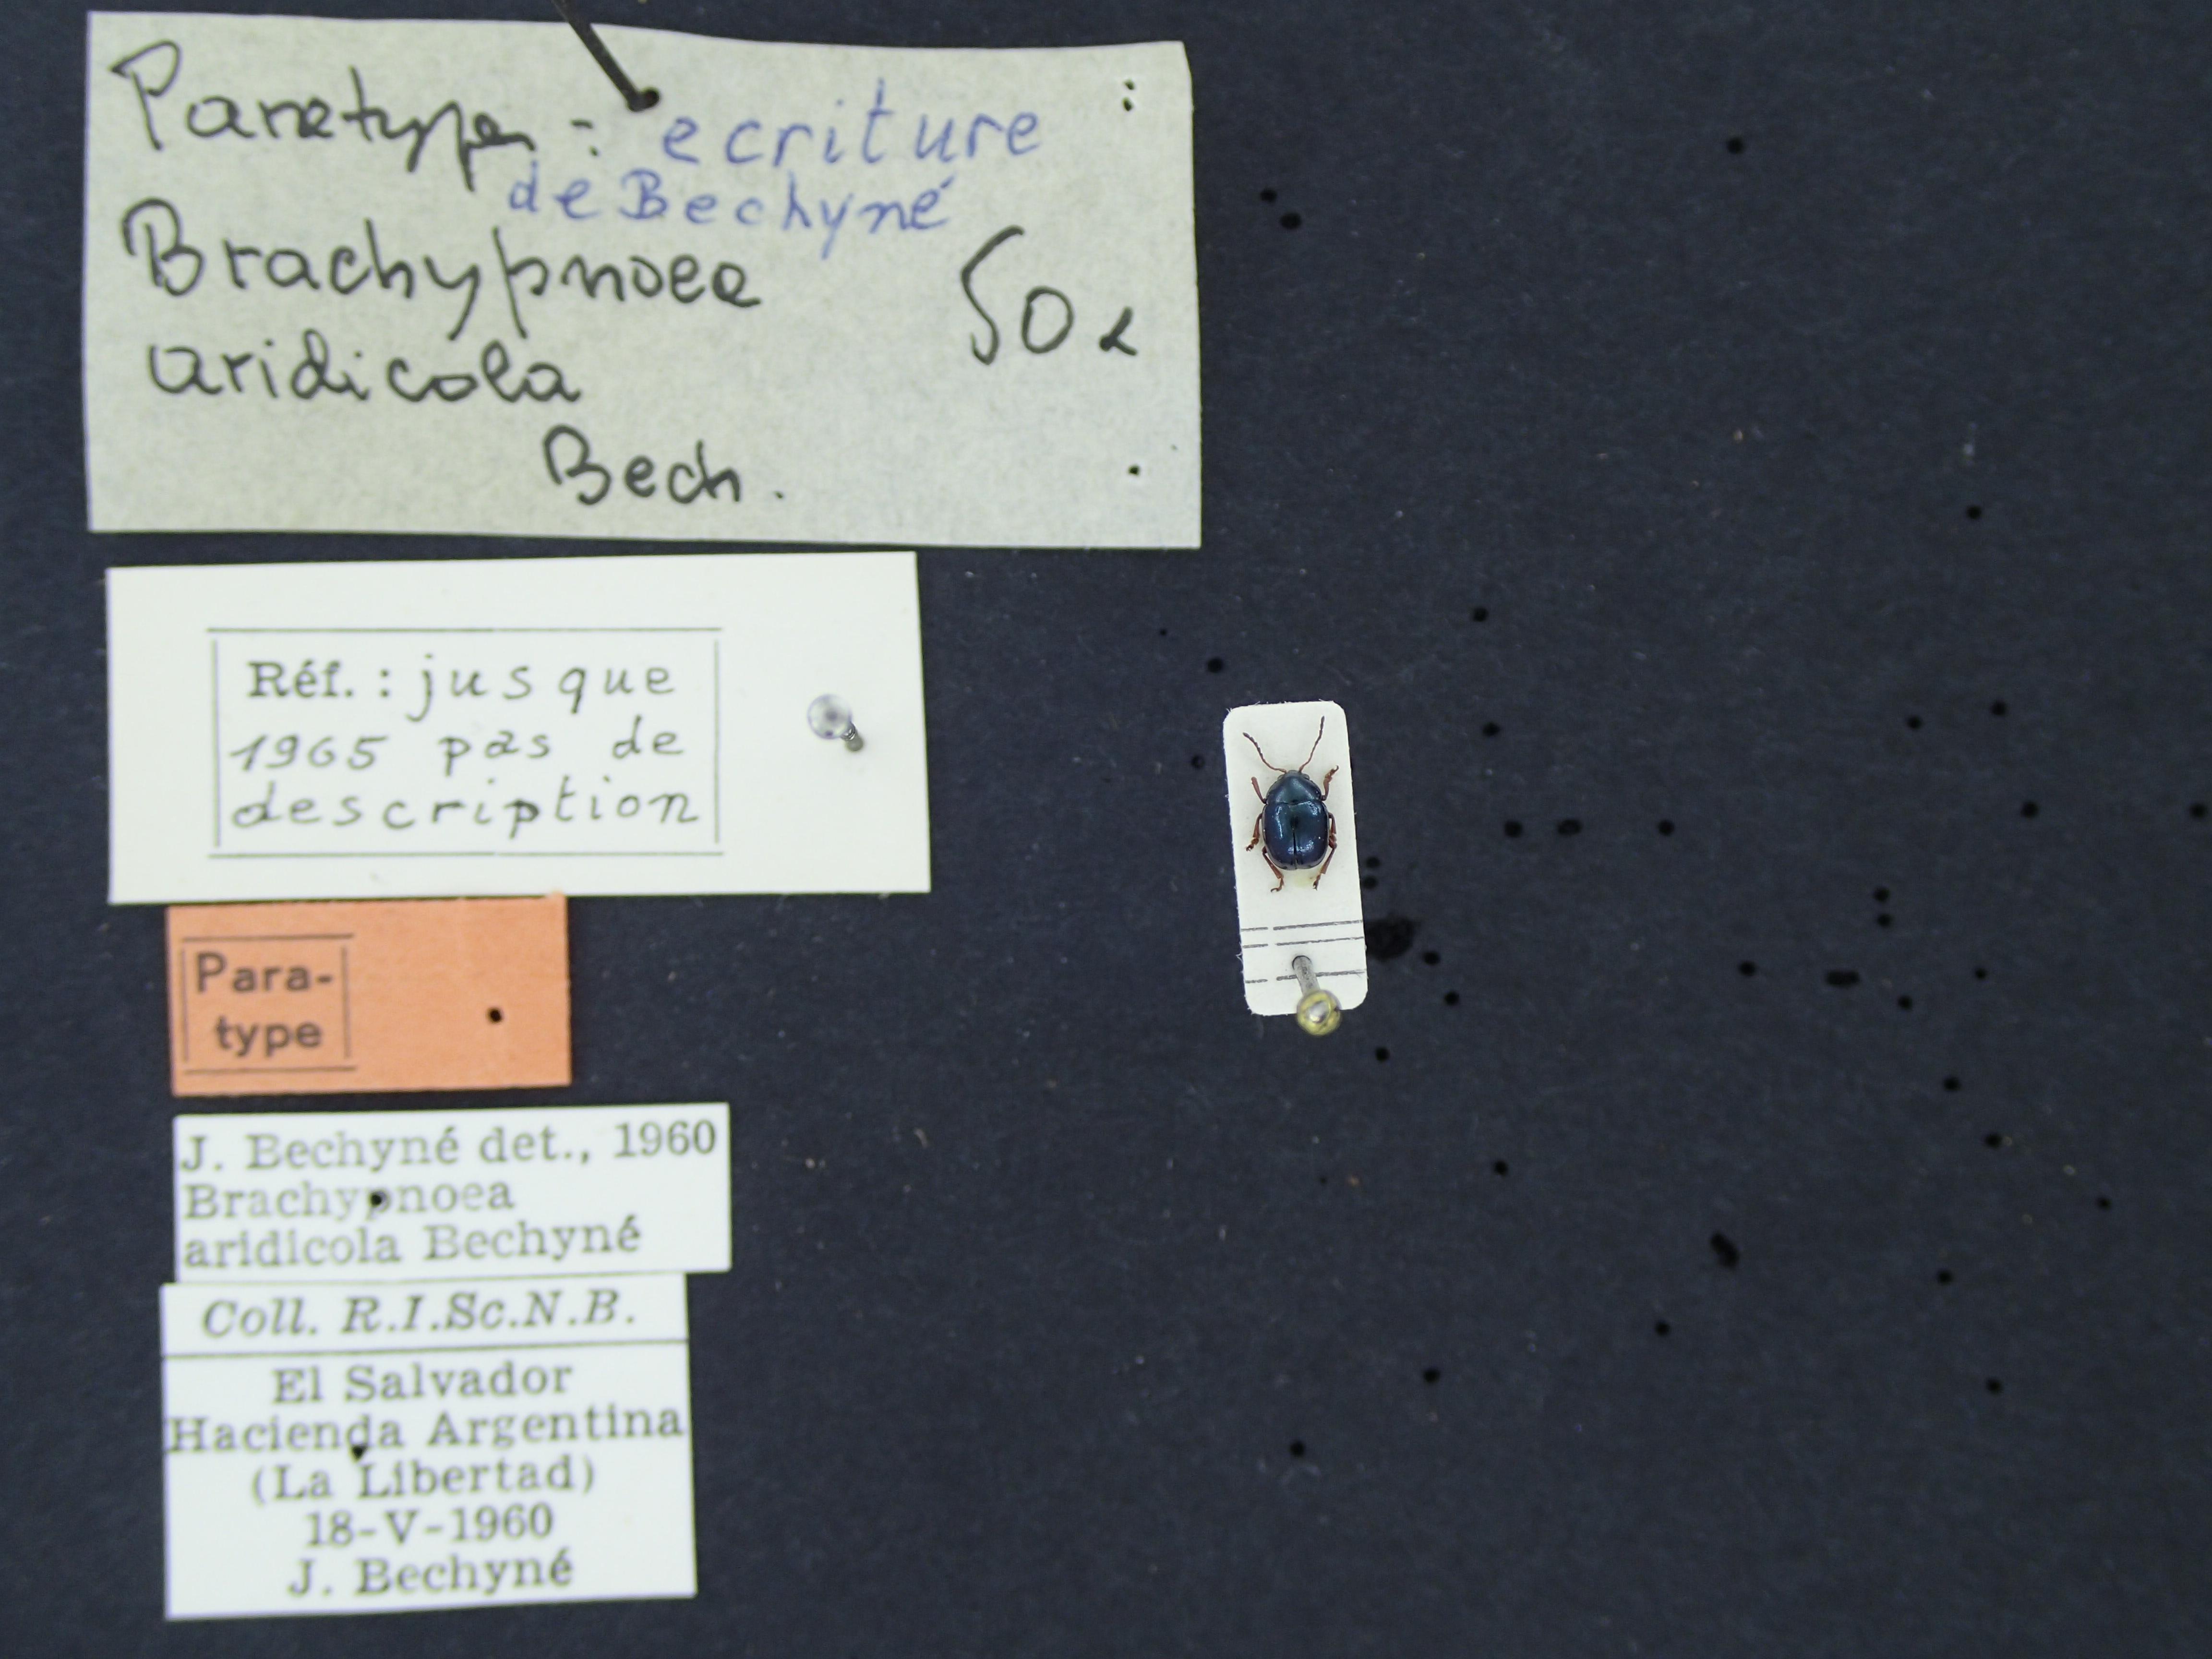 BE-RBINS-ENT Brachypnoea aridicola K30_D01_087 Label.JPG